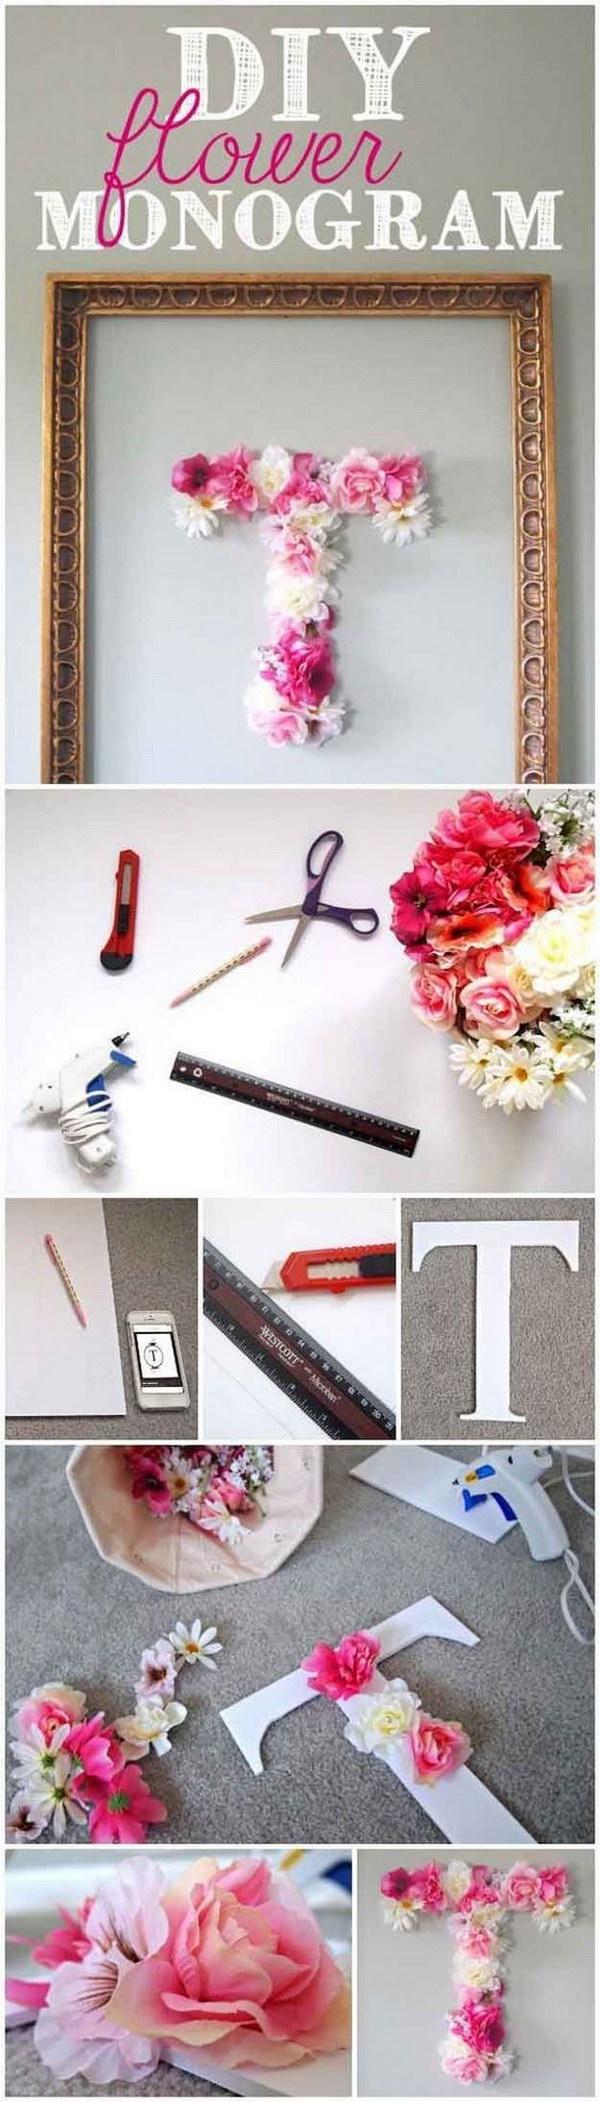 DIY Faux Flower Monogram